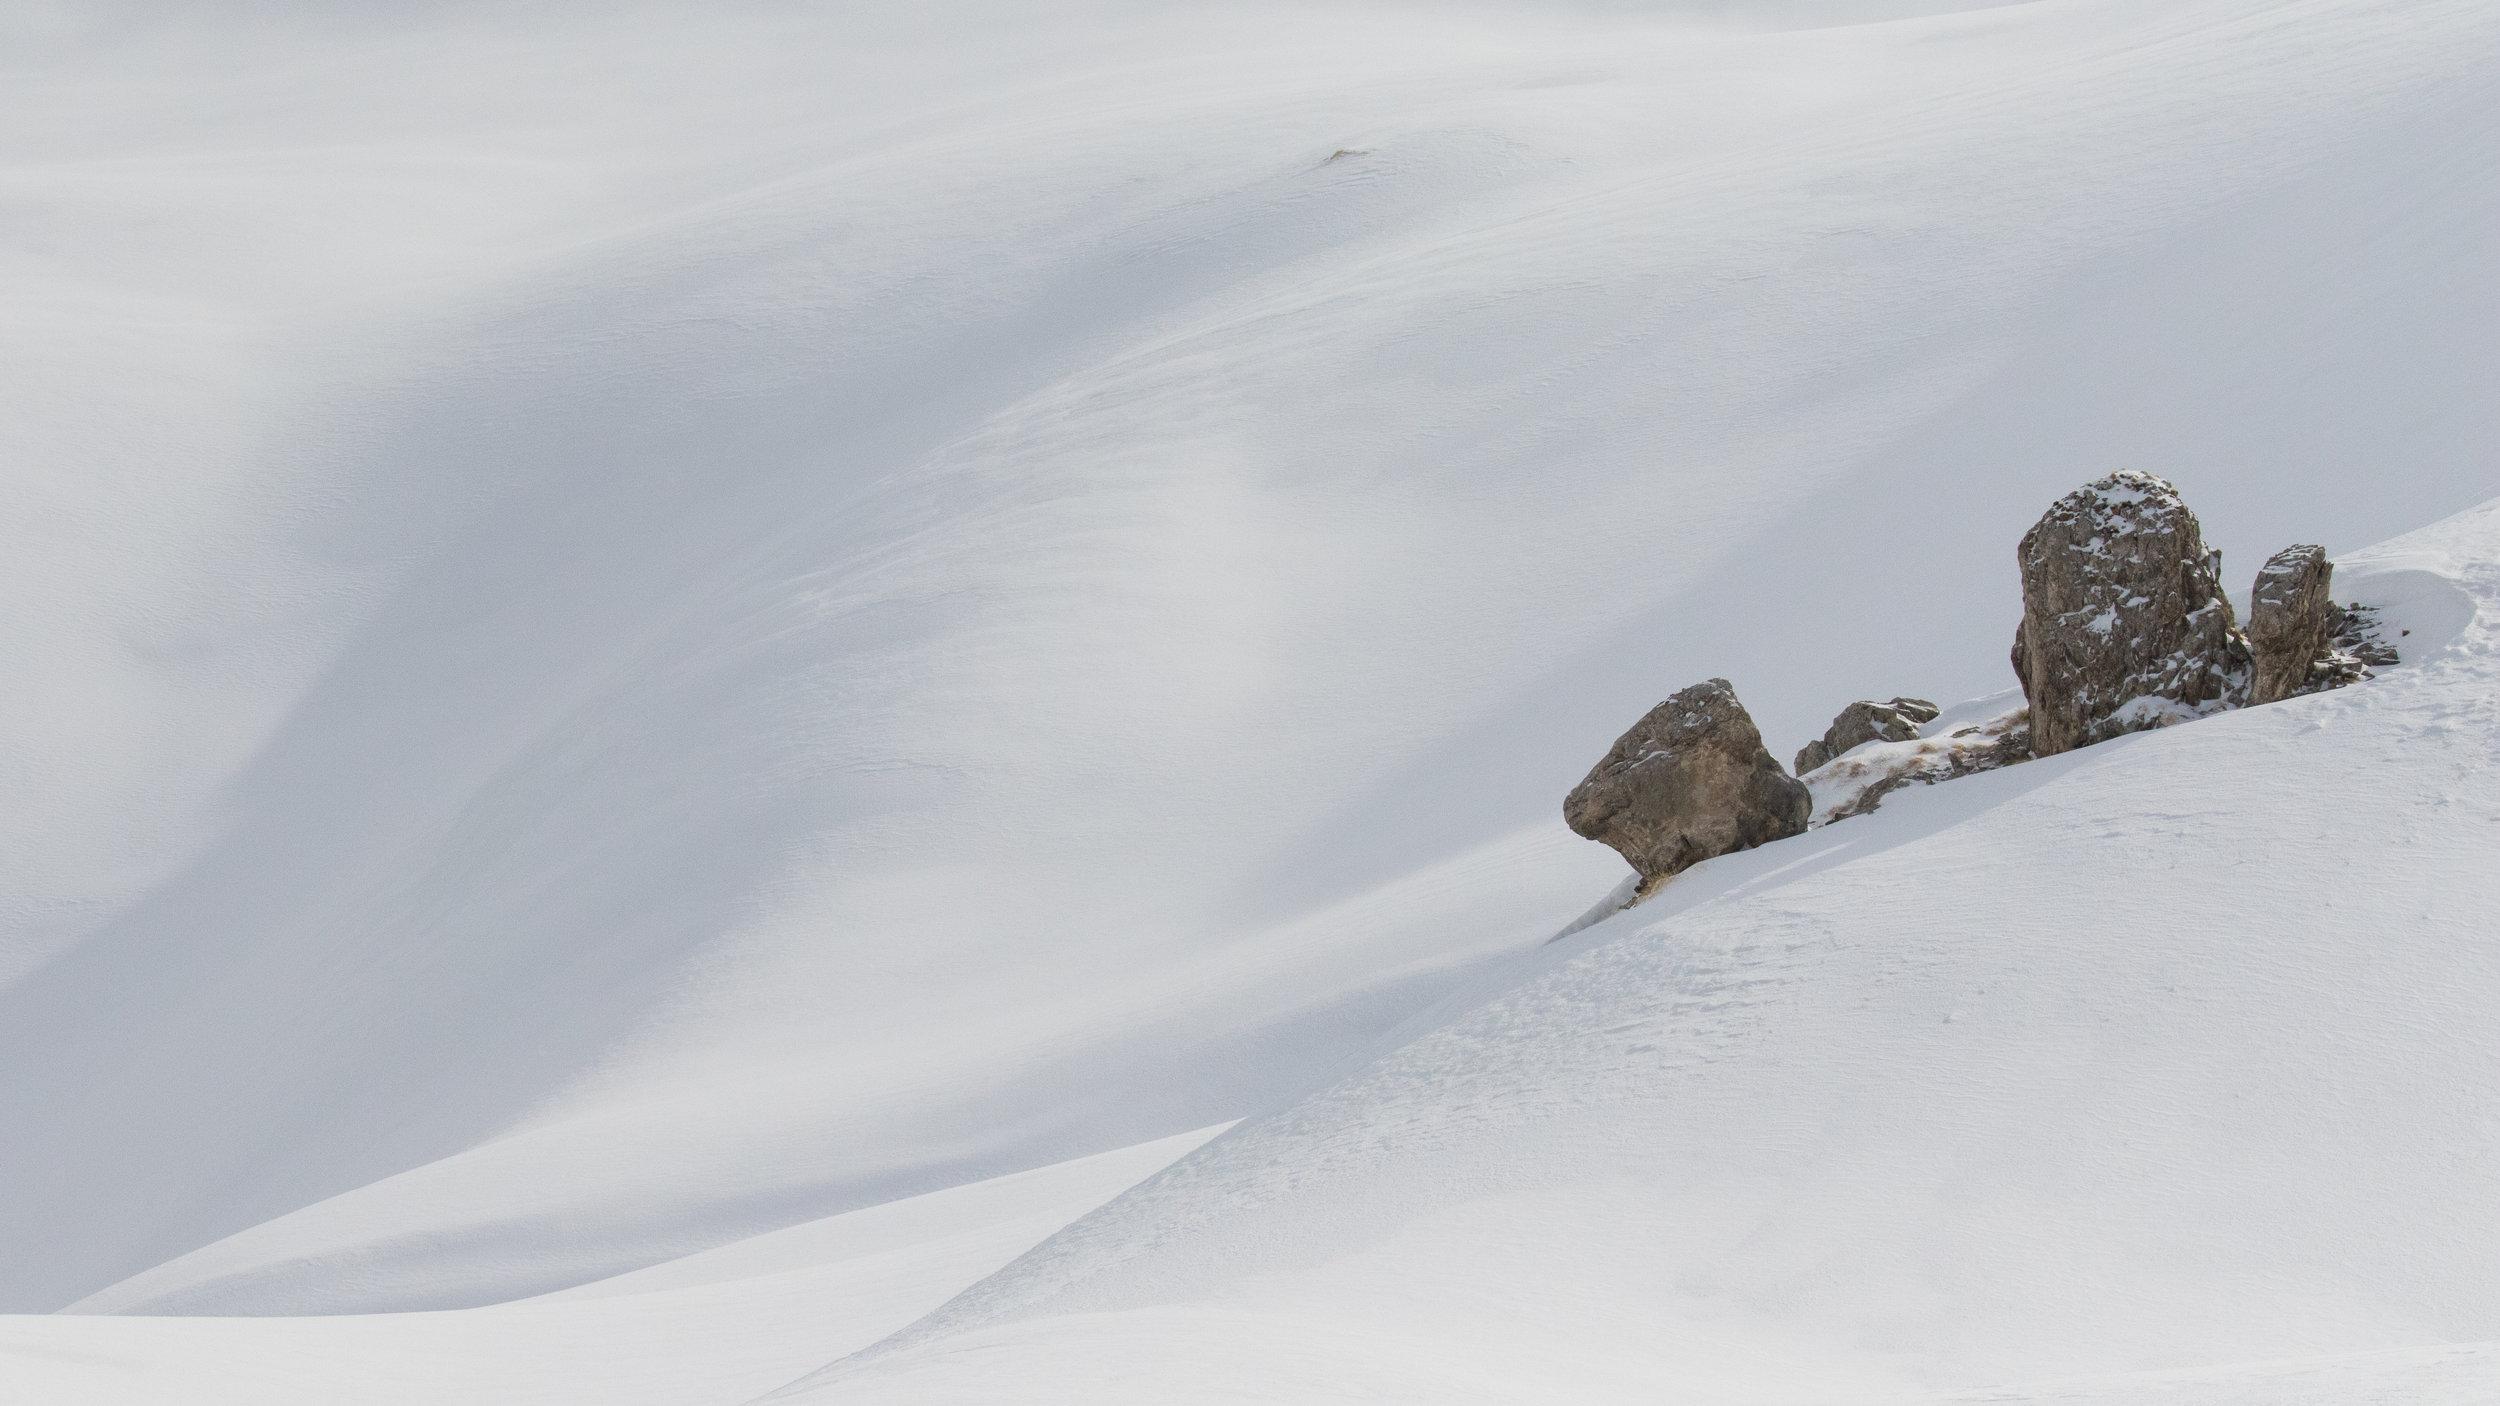 gemmipass-valais-wilderness-snow-switzerland-salva-fauna